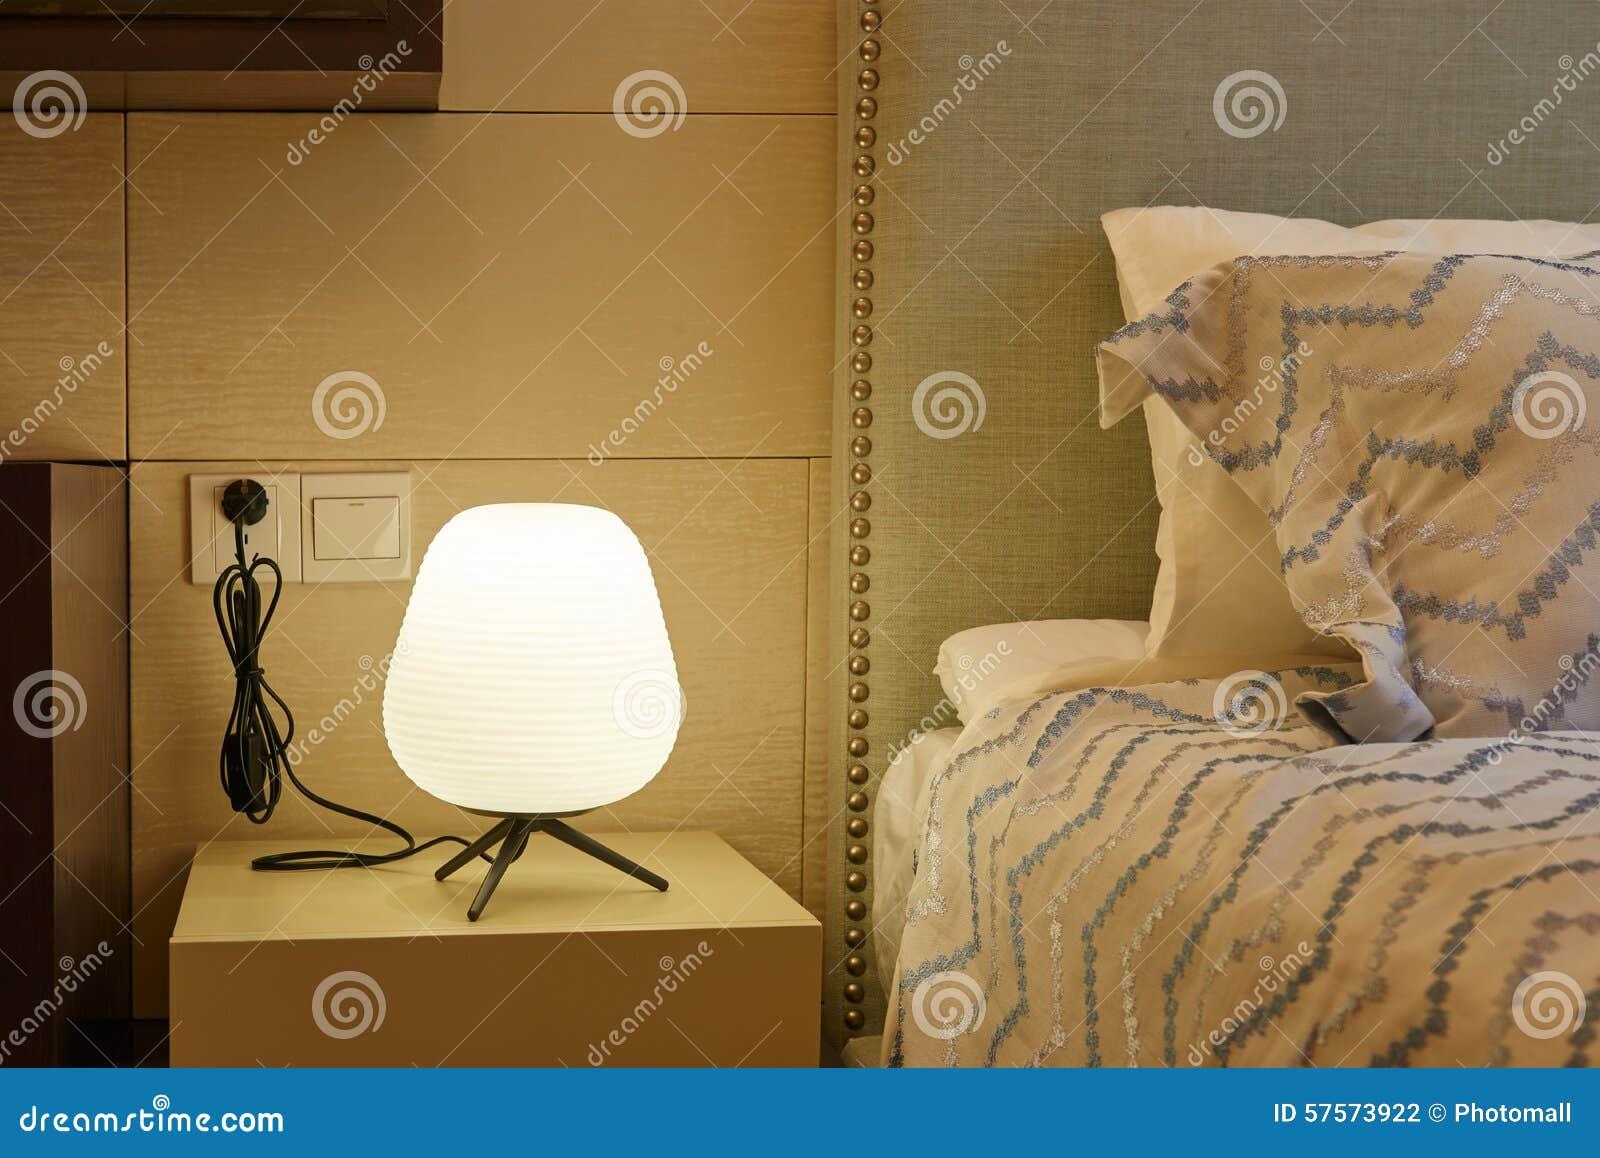 Lampa på nattduksbordet i sovrum arkivfoto   bild: 57573922